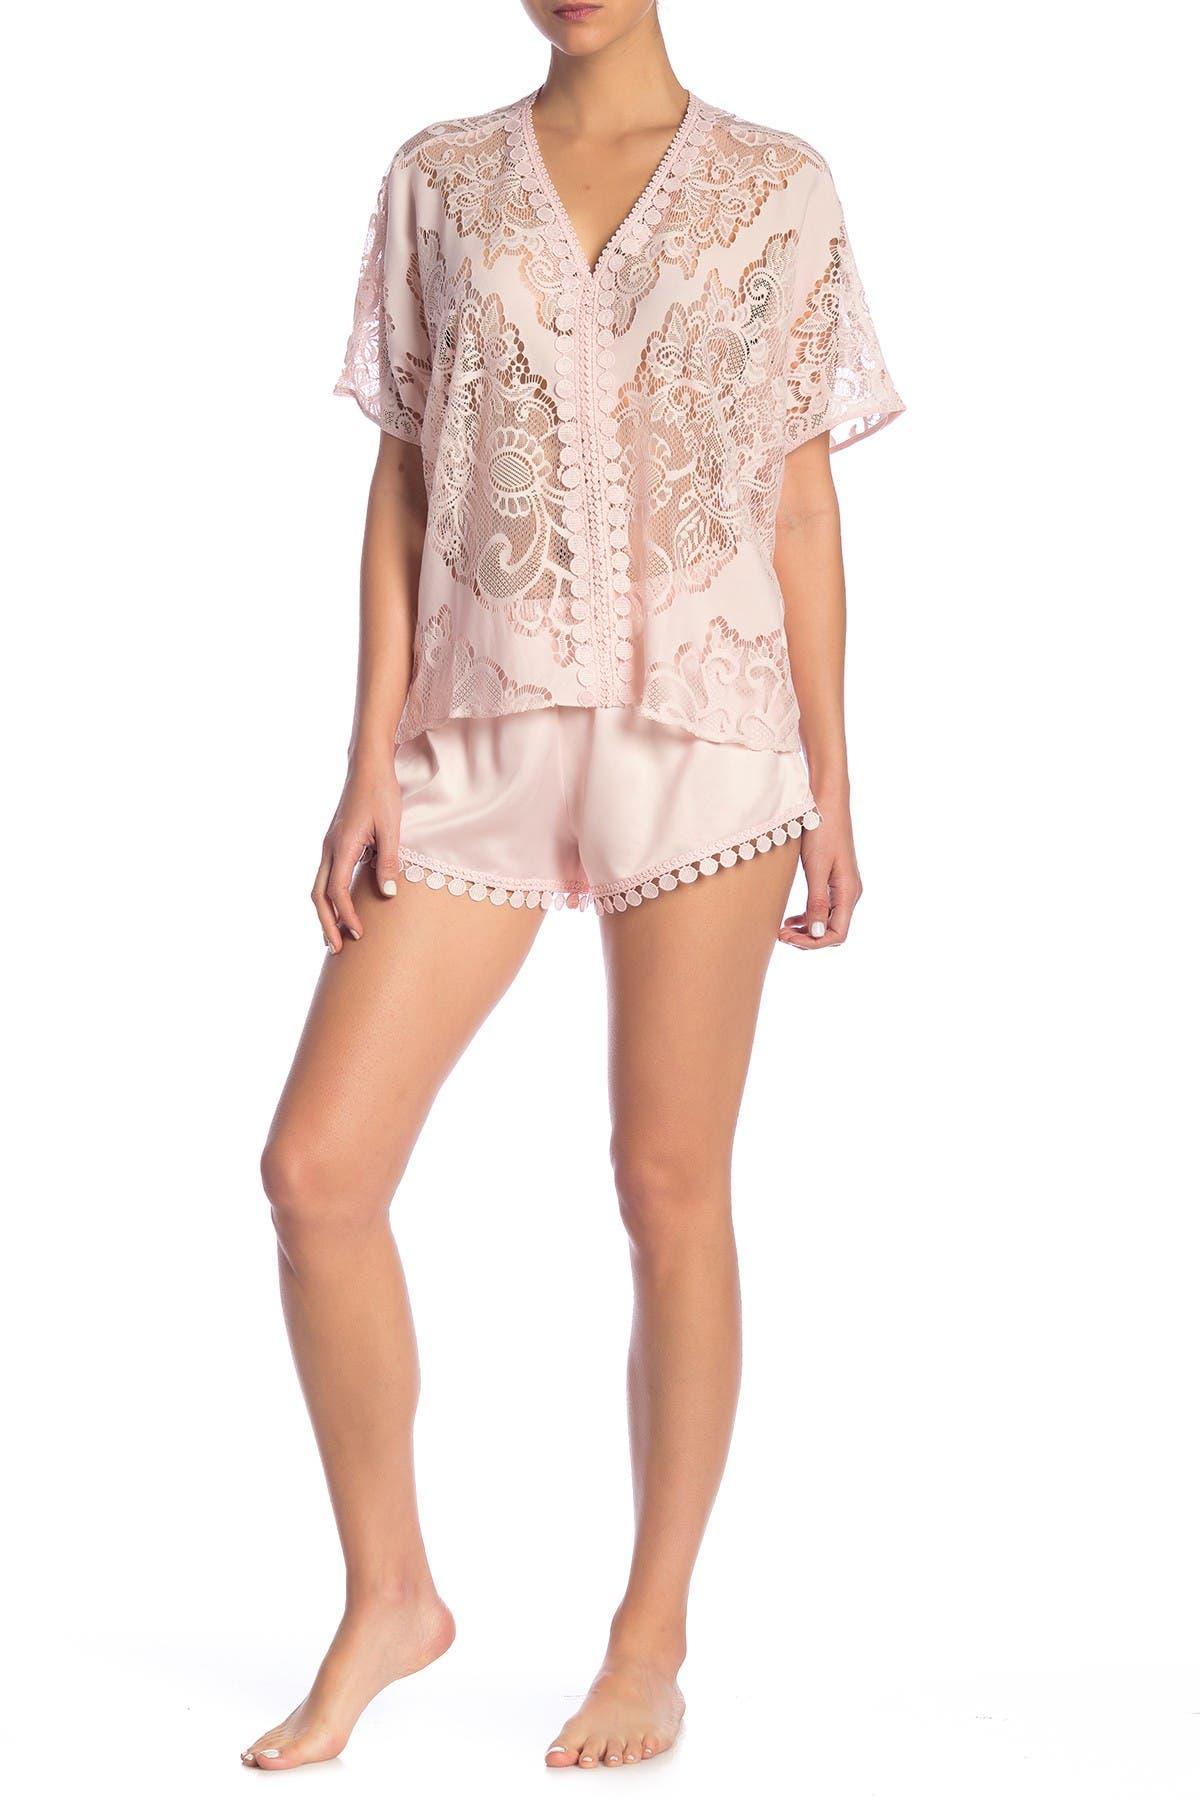 Image of Flora Nikrooz Sleepwear Millie Sheer Lace & Satin Pajama 2-Piece Set